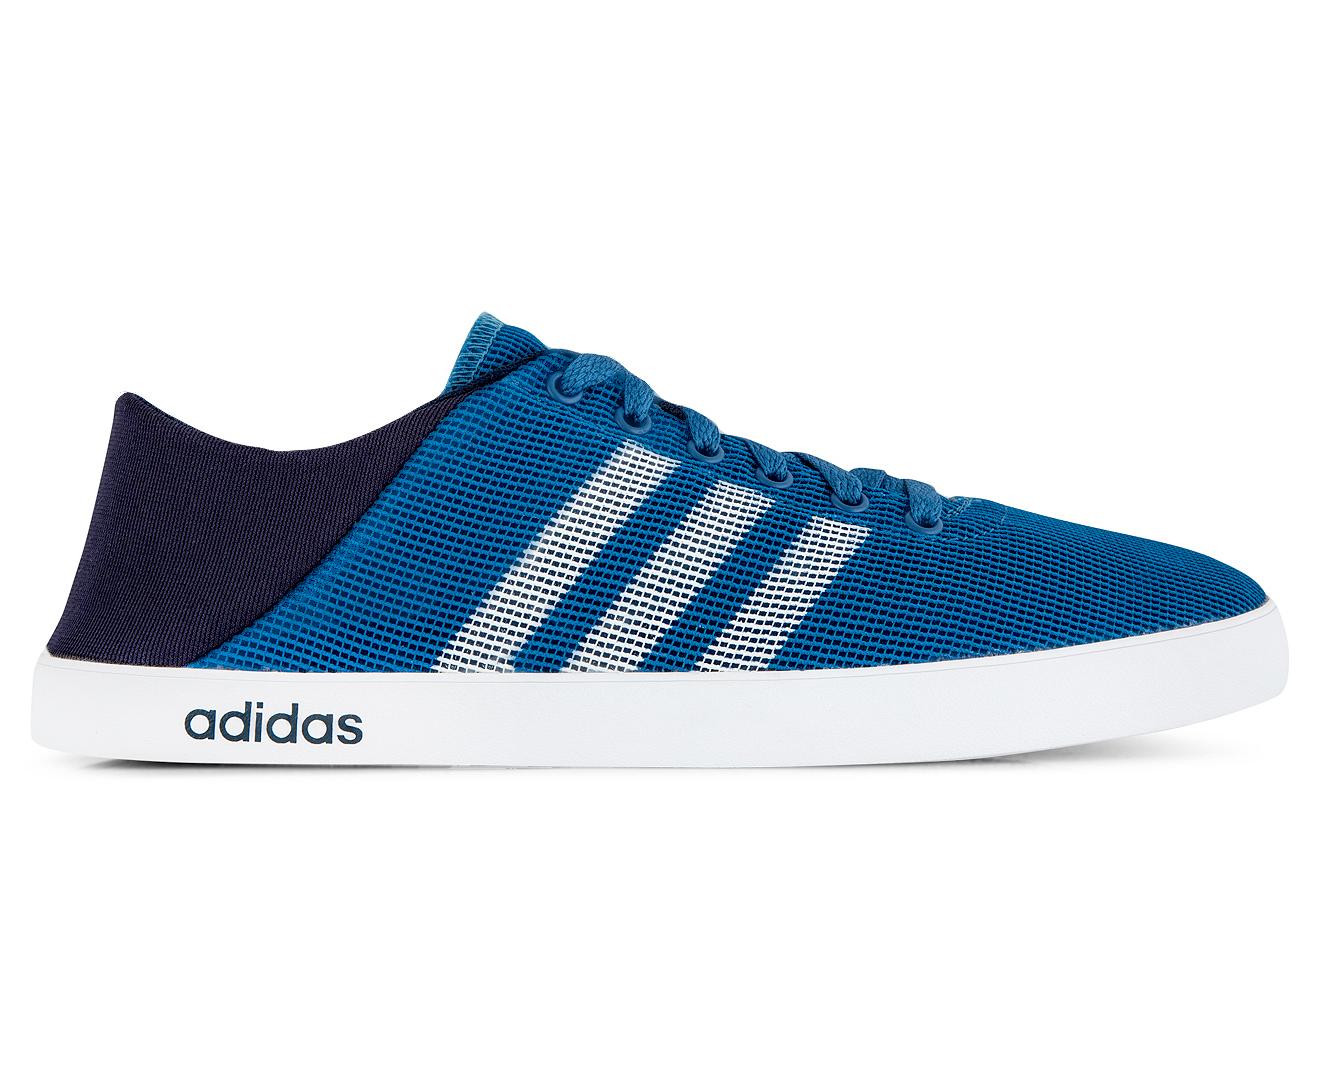 Adidas NEO Men's VS Easy Vulc Sea Shoe Corn BlueWhiteCollegiate Navy